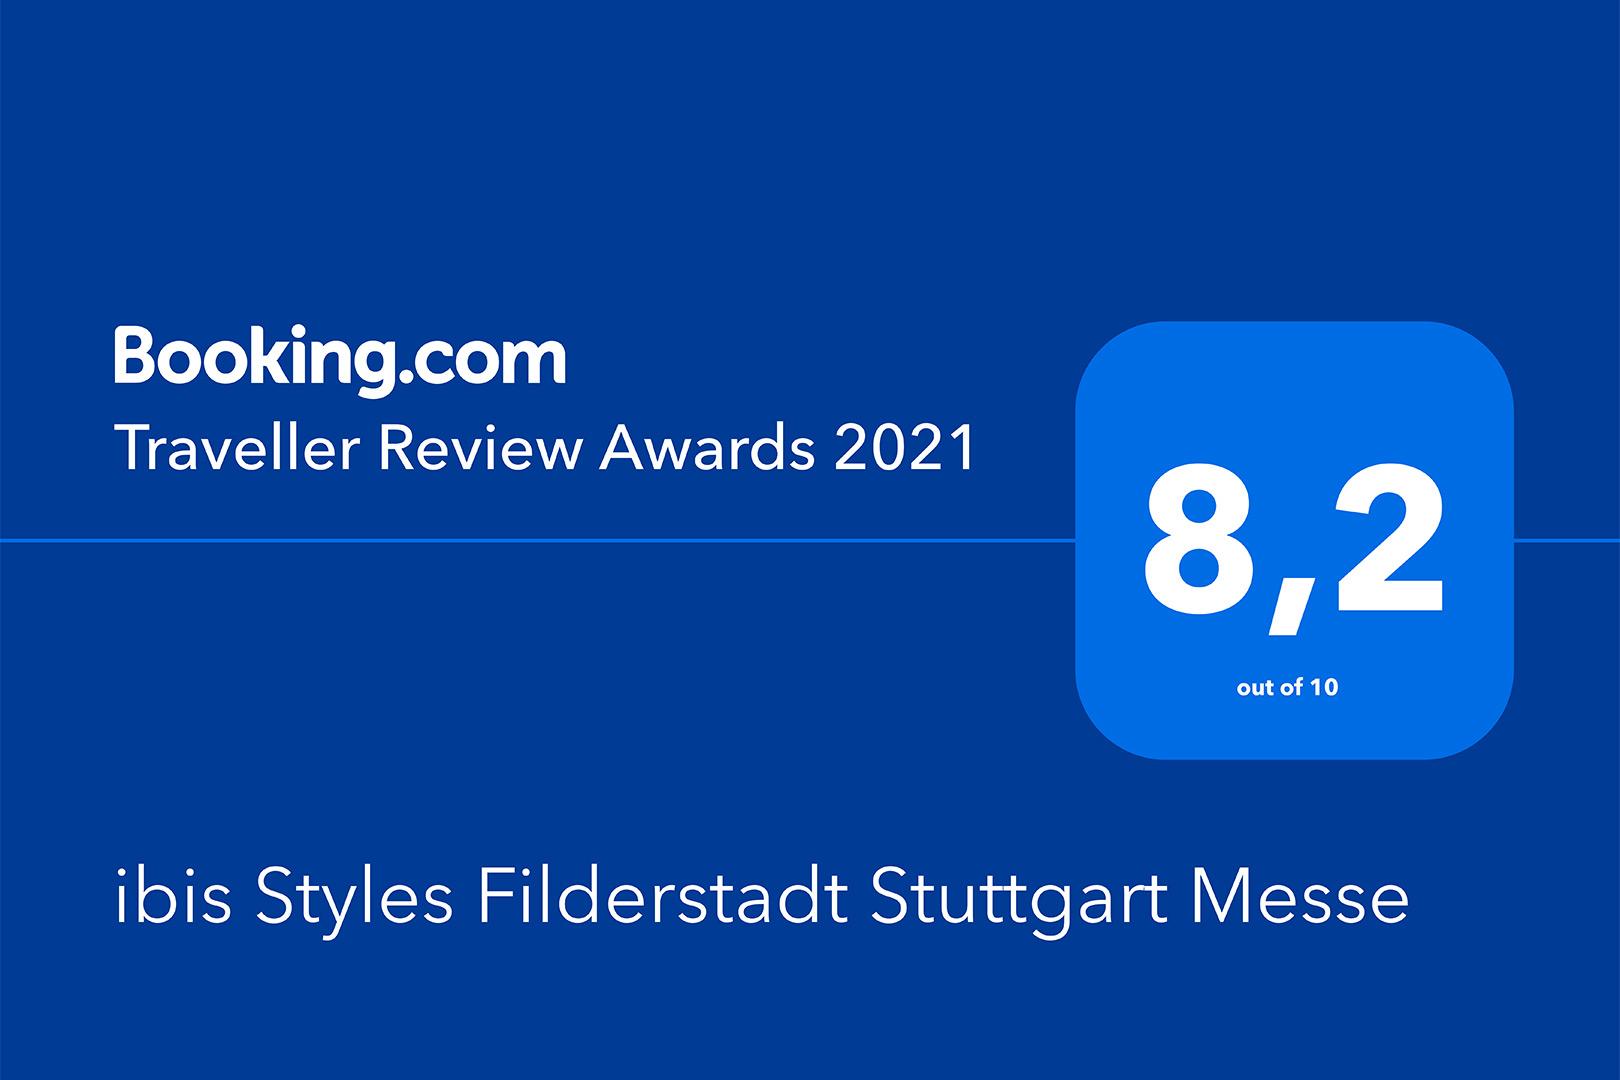 ibis Styles Filderstadt Stuttgart Messe - Traveller Review Award 2021